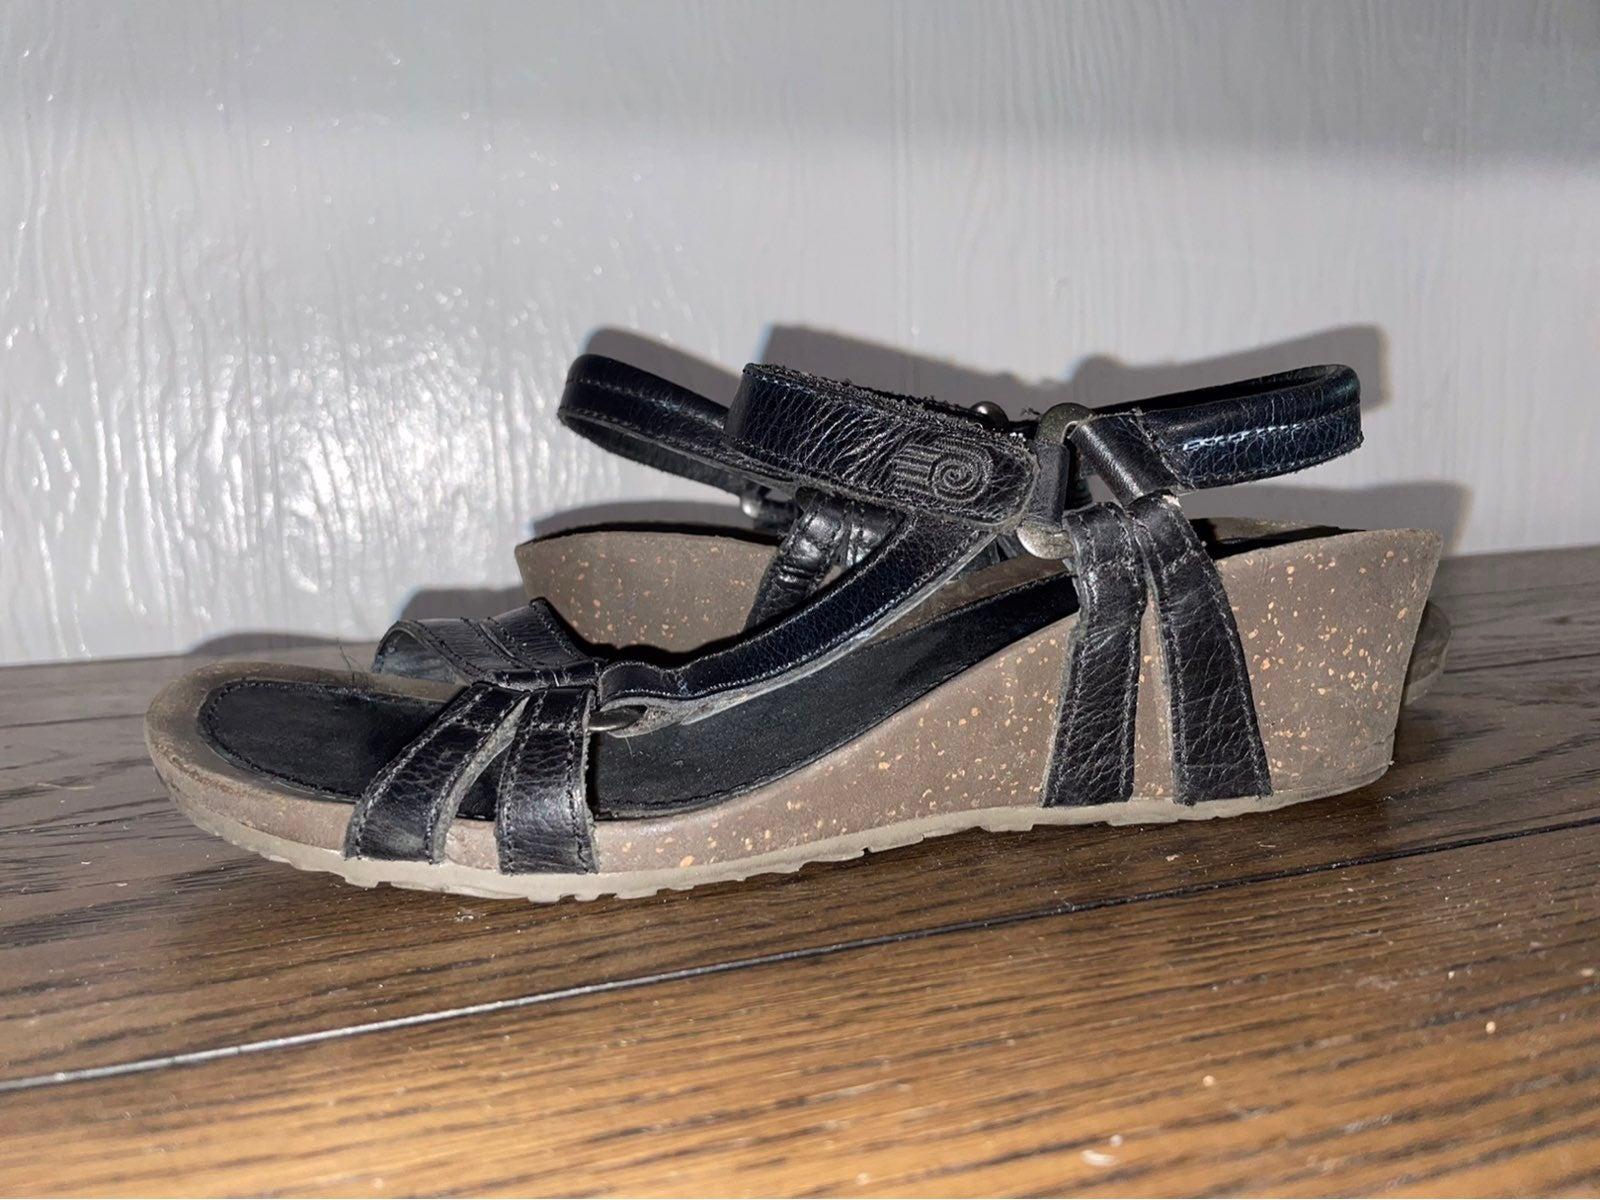 Teva Ventura wedge sandal 8